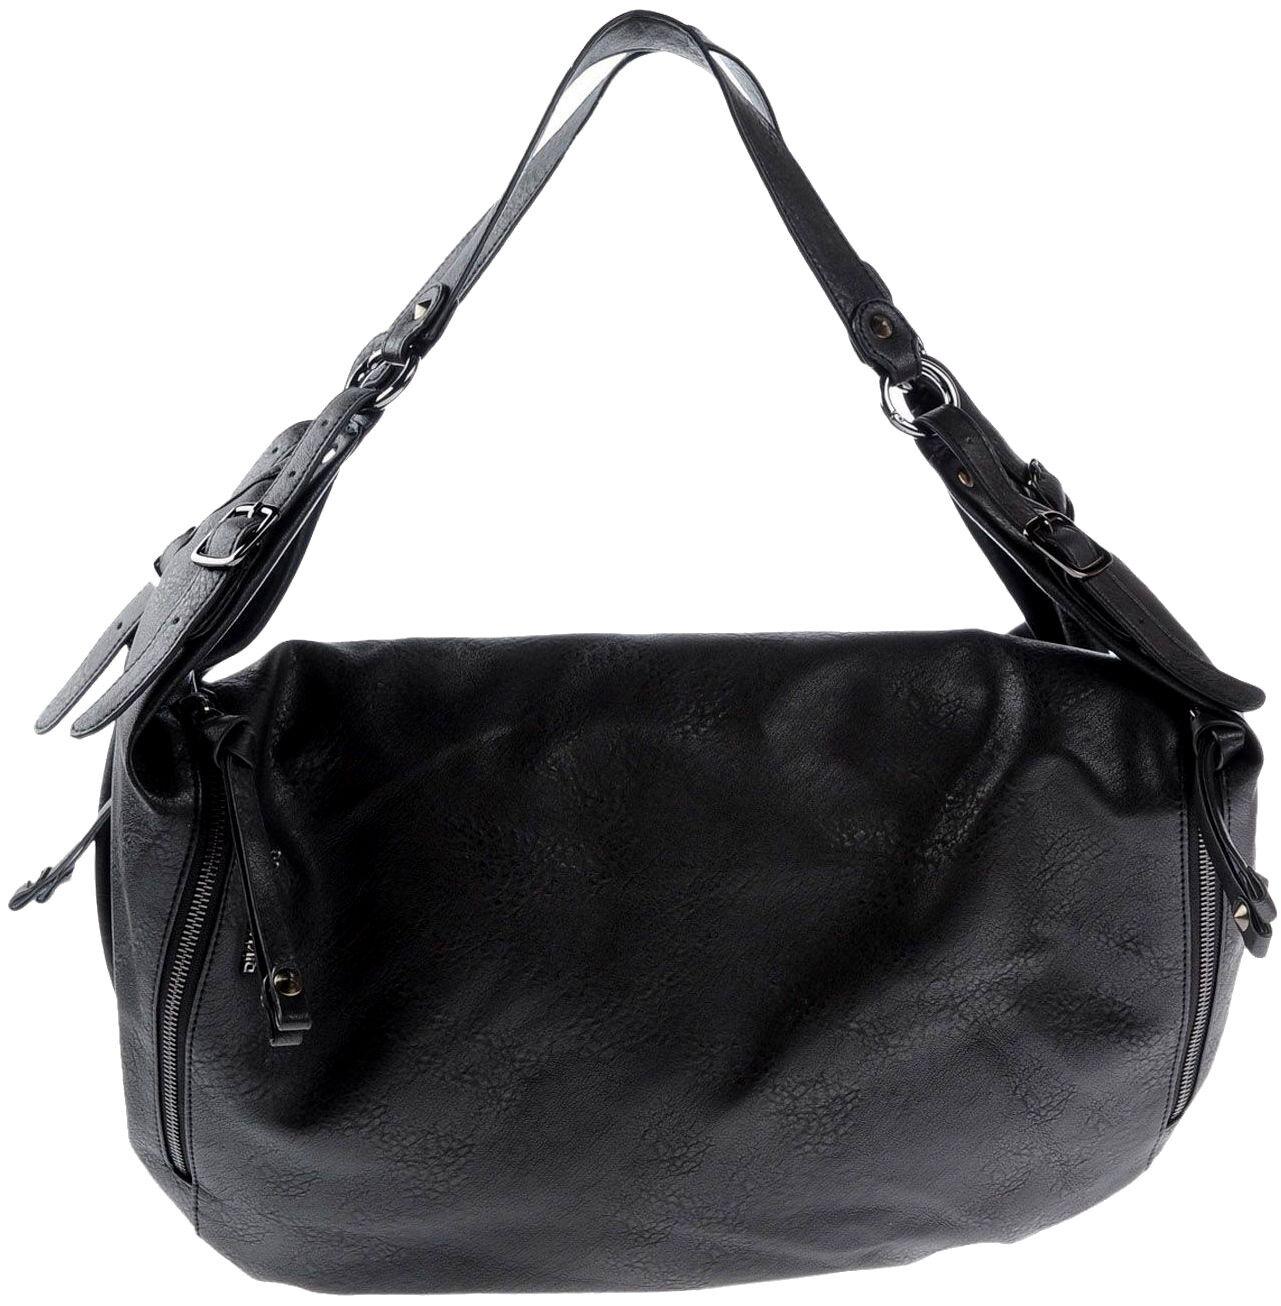 9426cf8753 Zaino Borsa Donna Bikkembergs Backpack Bag Donna Db- Hard Shoulder Shoulder  Shoulder Bag D0304 Bla c9f1b9